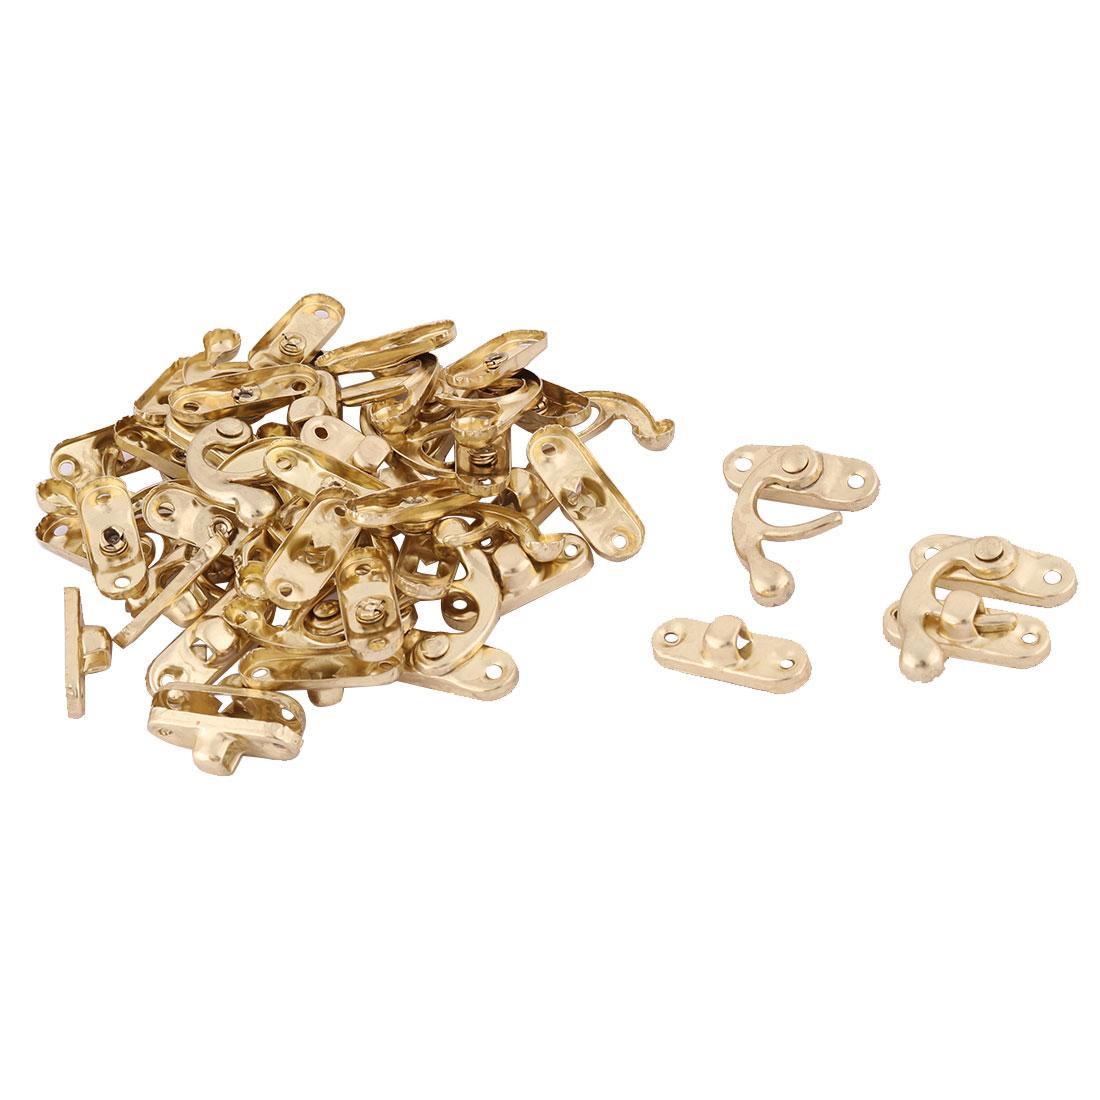 Metal Retro Style Bag Closure Hasp Lock Case Box Latch Buckle Gold Tone 20pcs